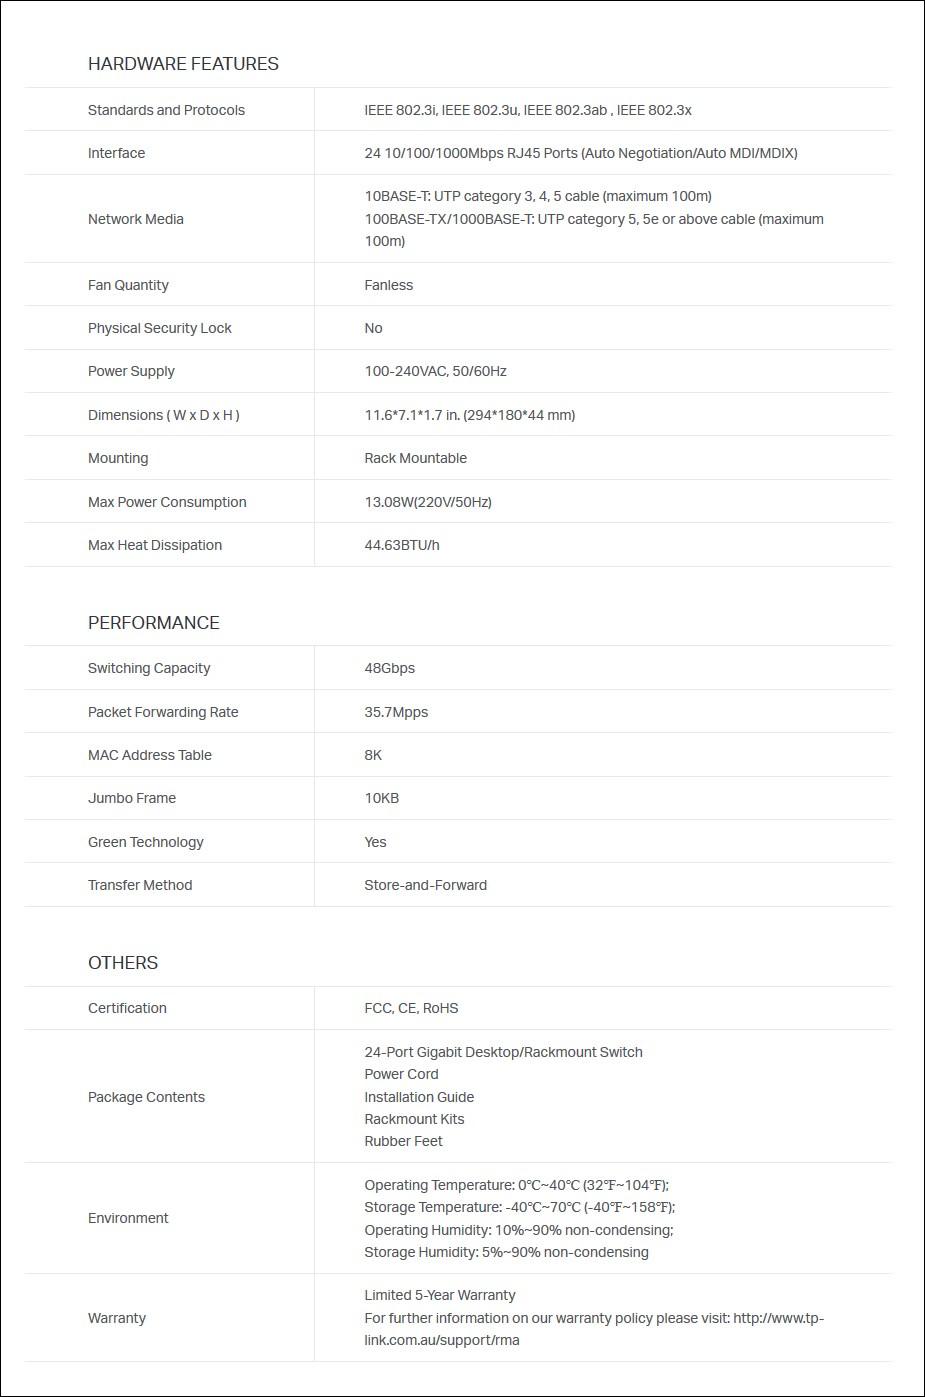 TP-LINK TL-SG1024D 24 Port Gigabit Desktop / Rackmount Switch - Metal Housing - Overview 2